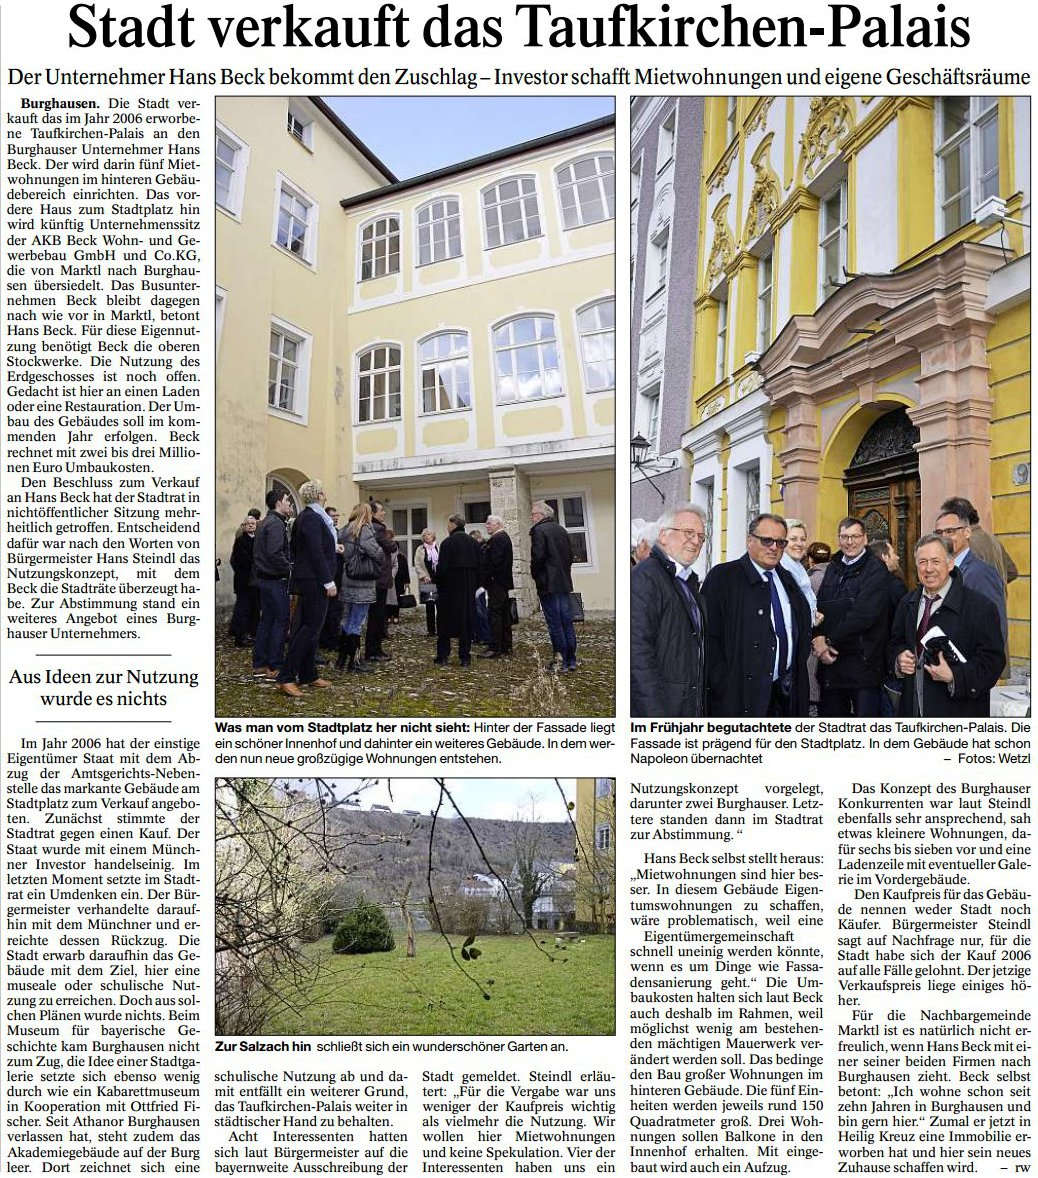 PNP_20151125_TaufkirchenPalais